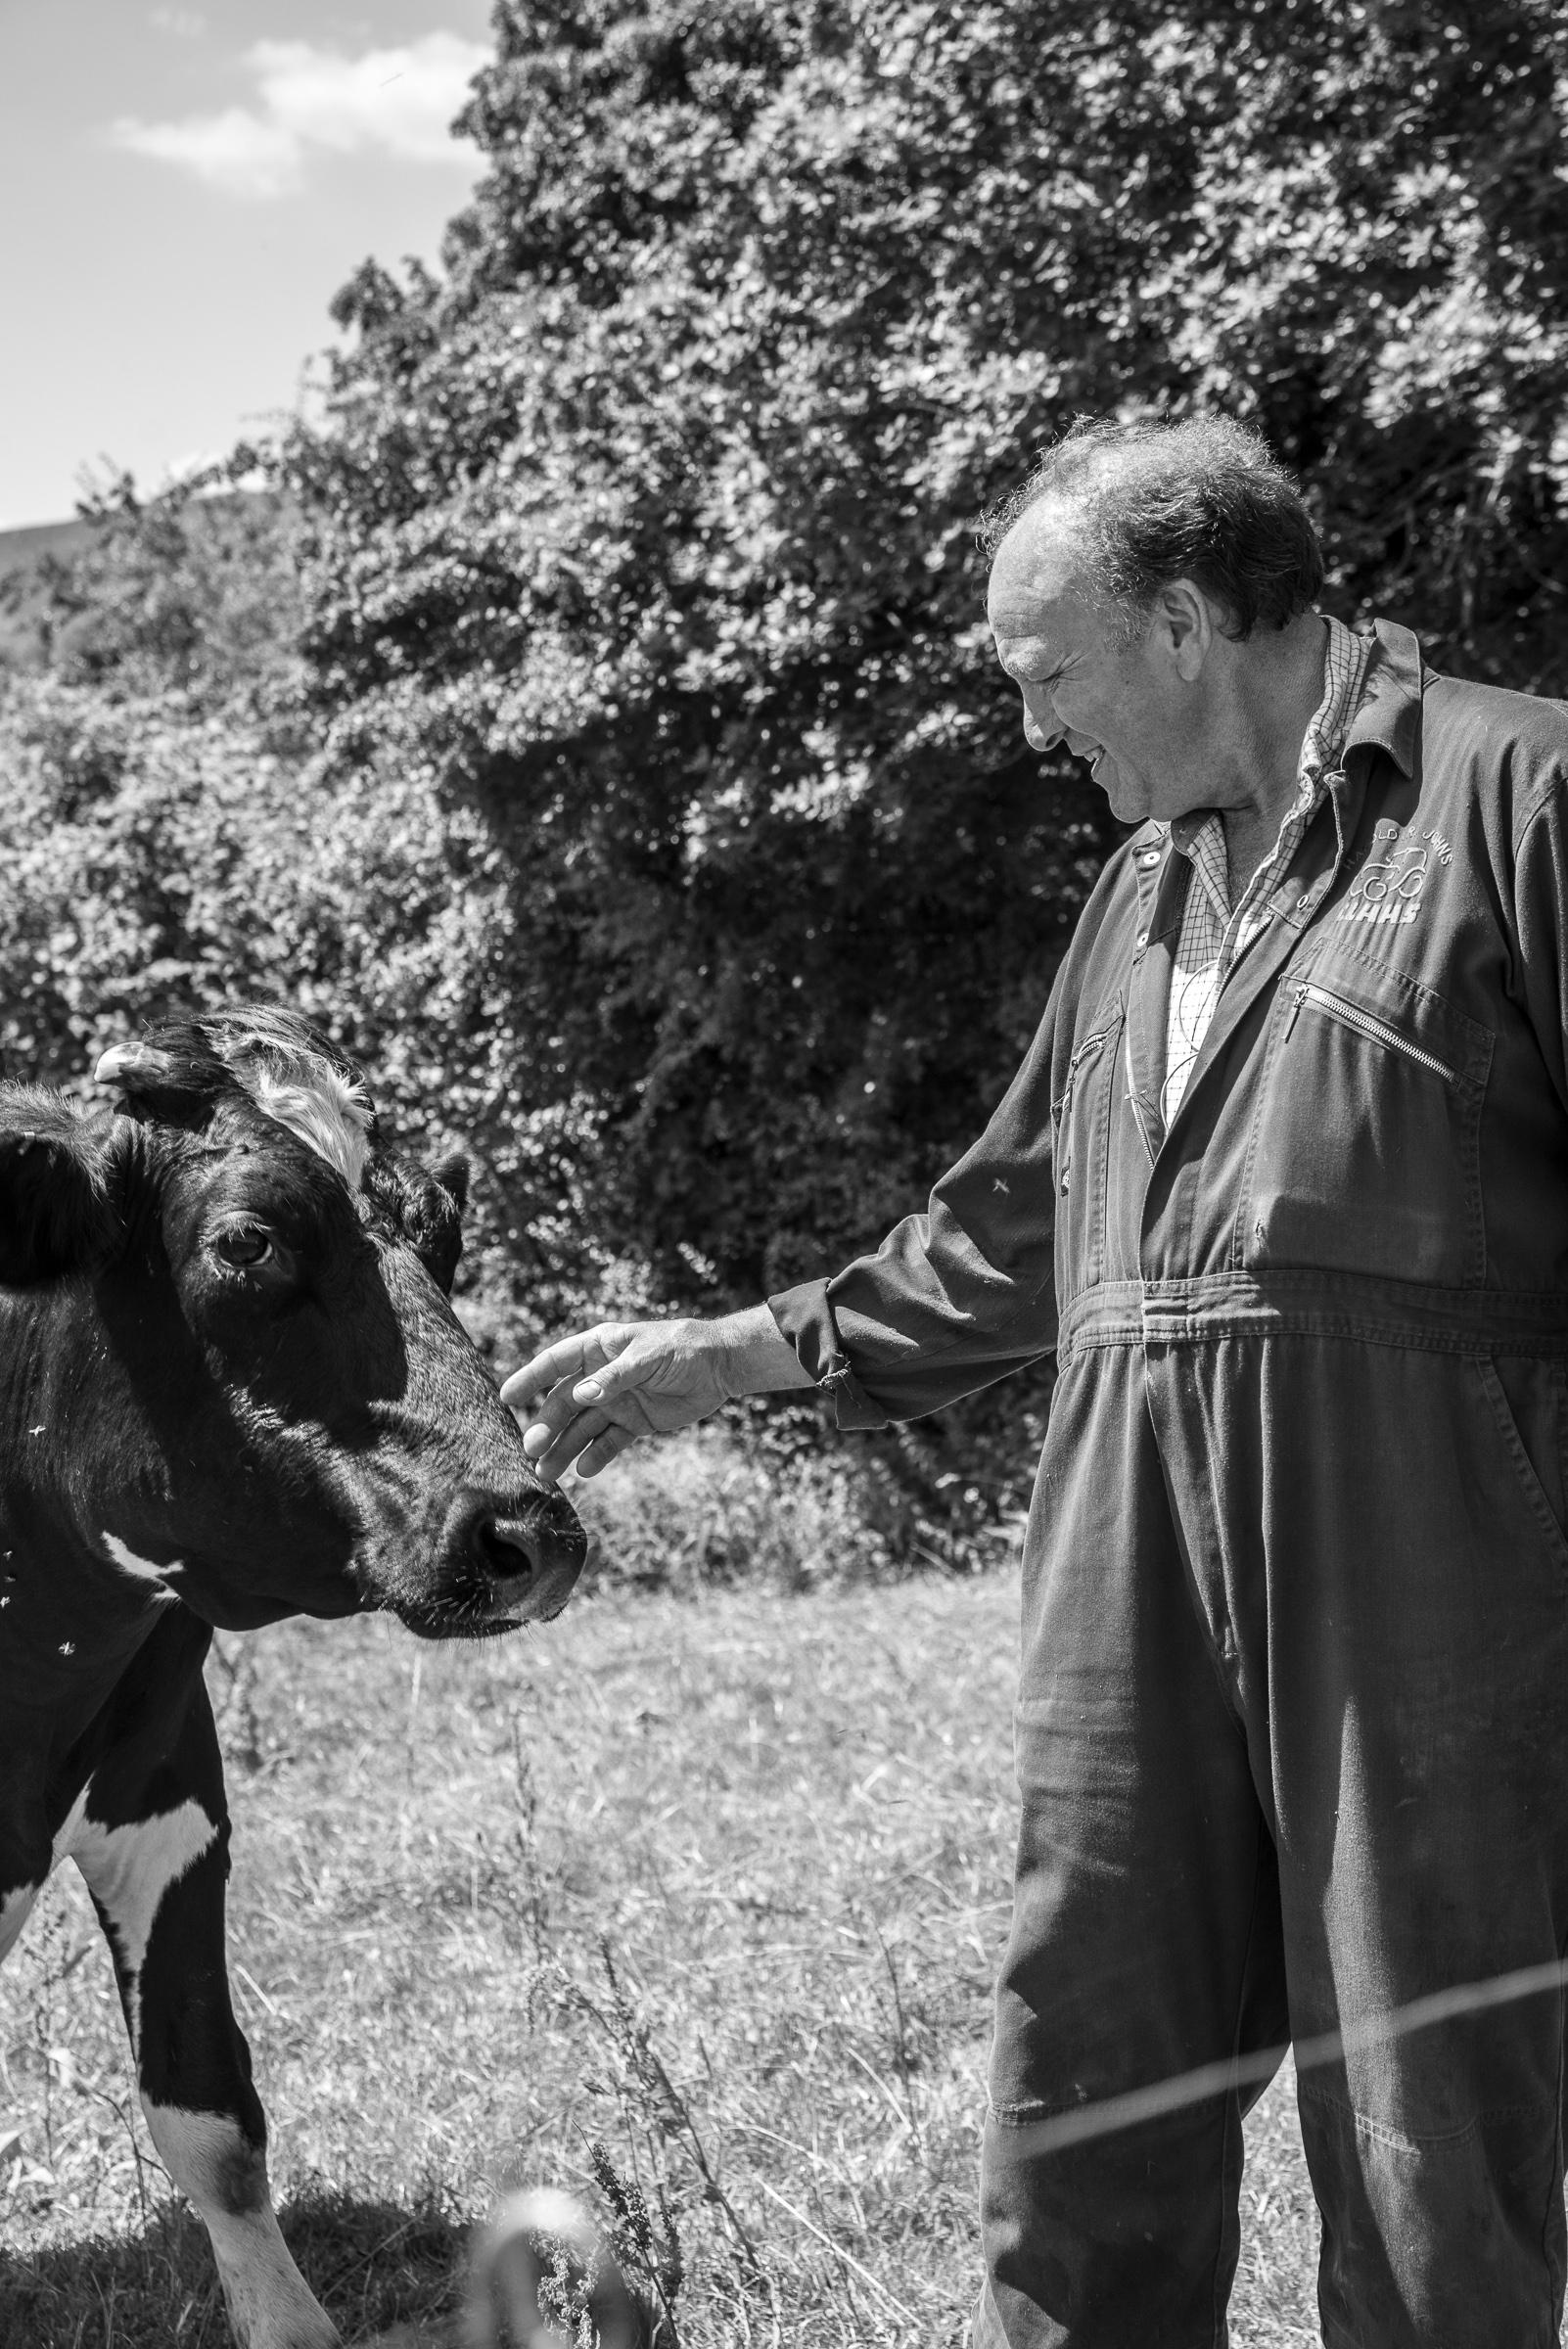 Puddleston-Herd-Clodock-2018-32.jpg